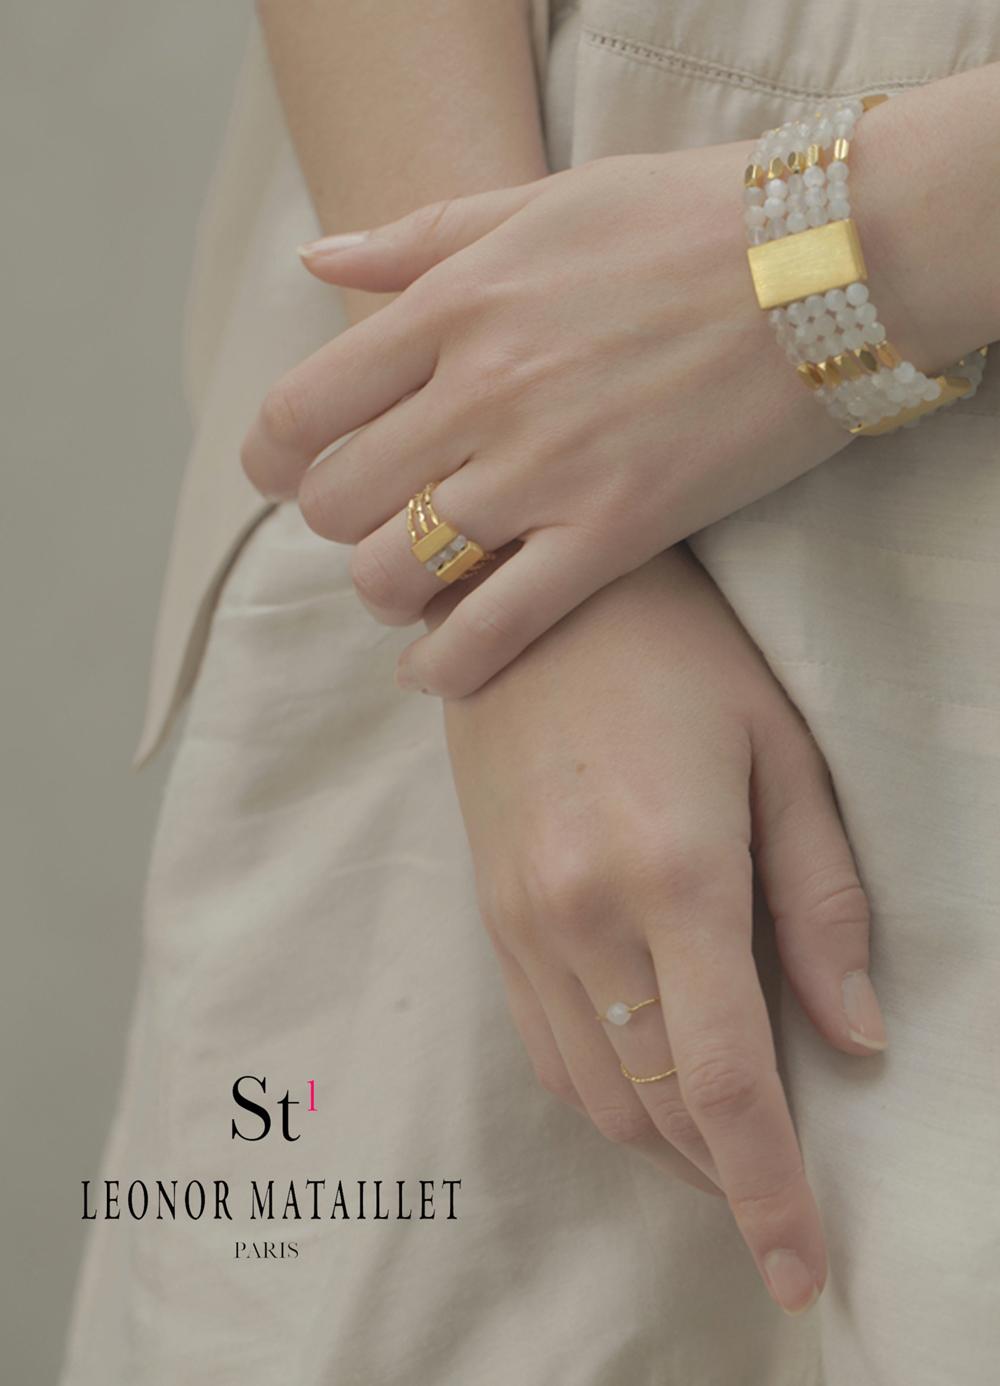 Leonor Mataillet bijoux st1